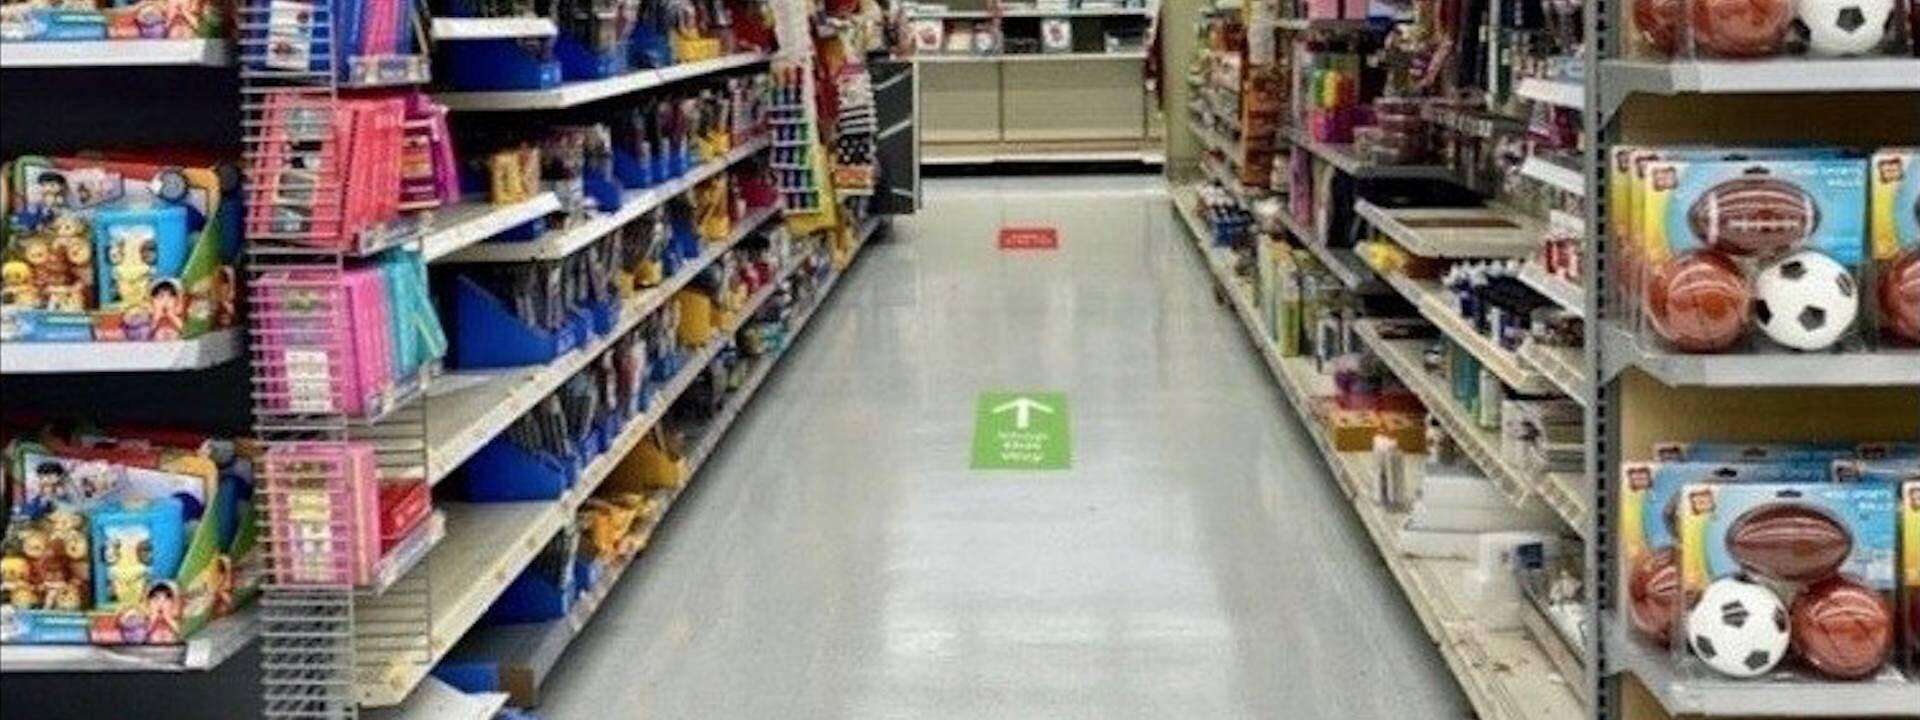 Retail_shopping_Aisle_